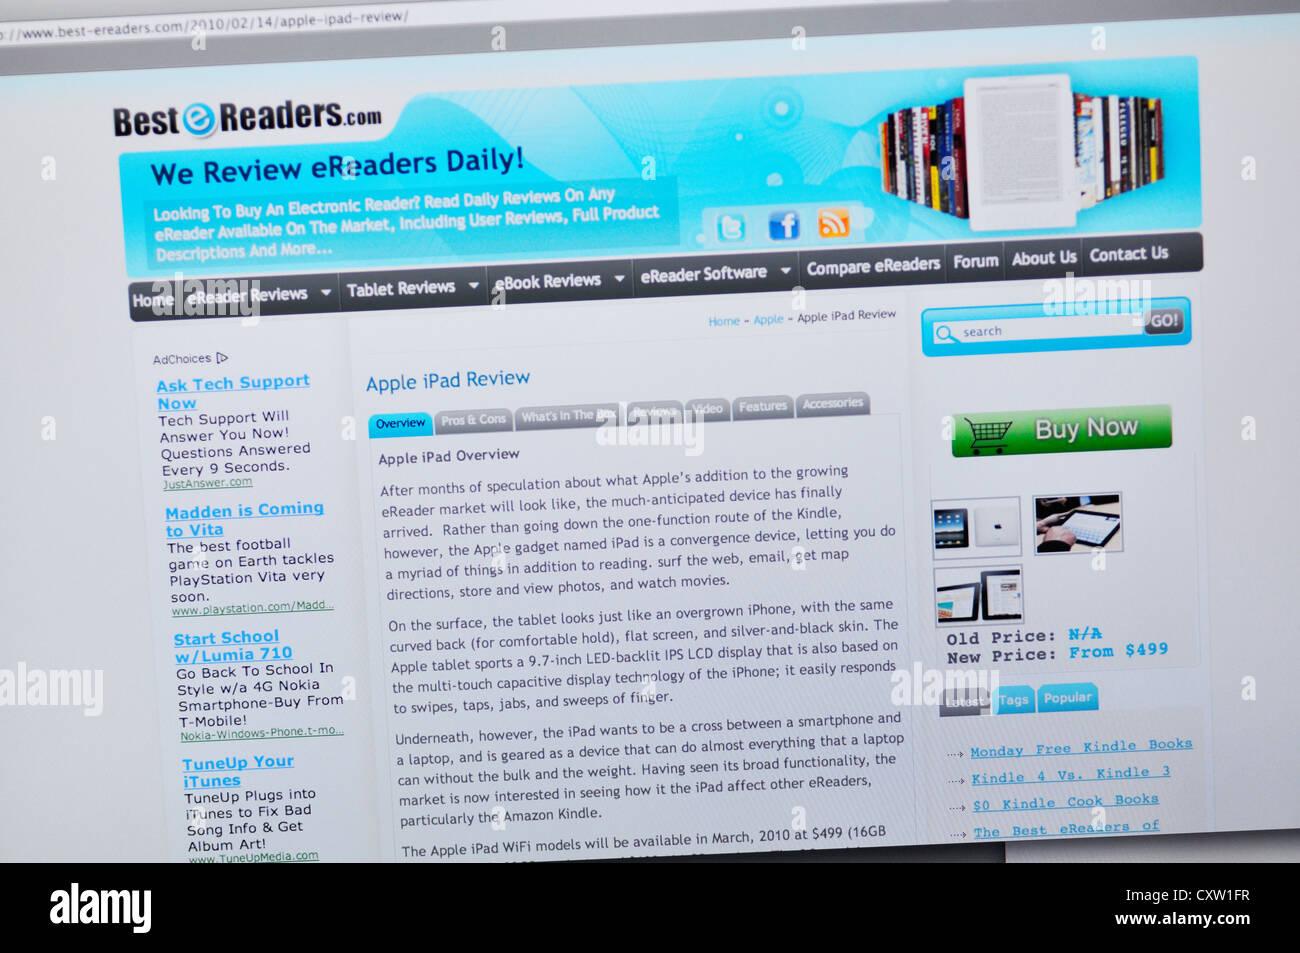 Best eReaders website - eReader reviews Stock Photo